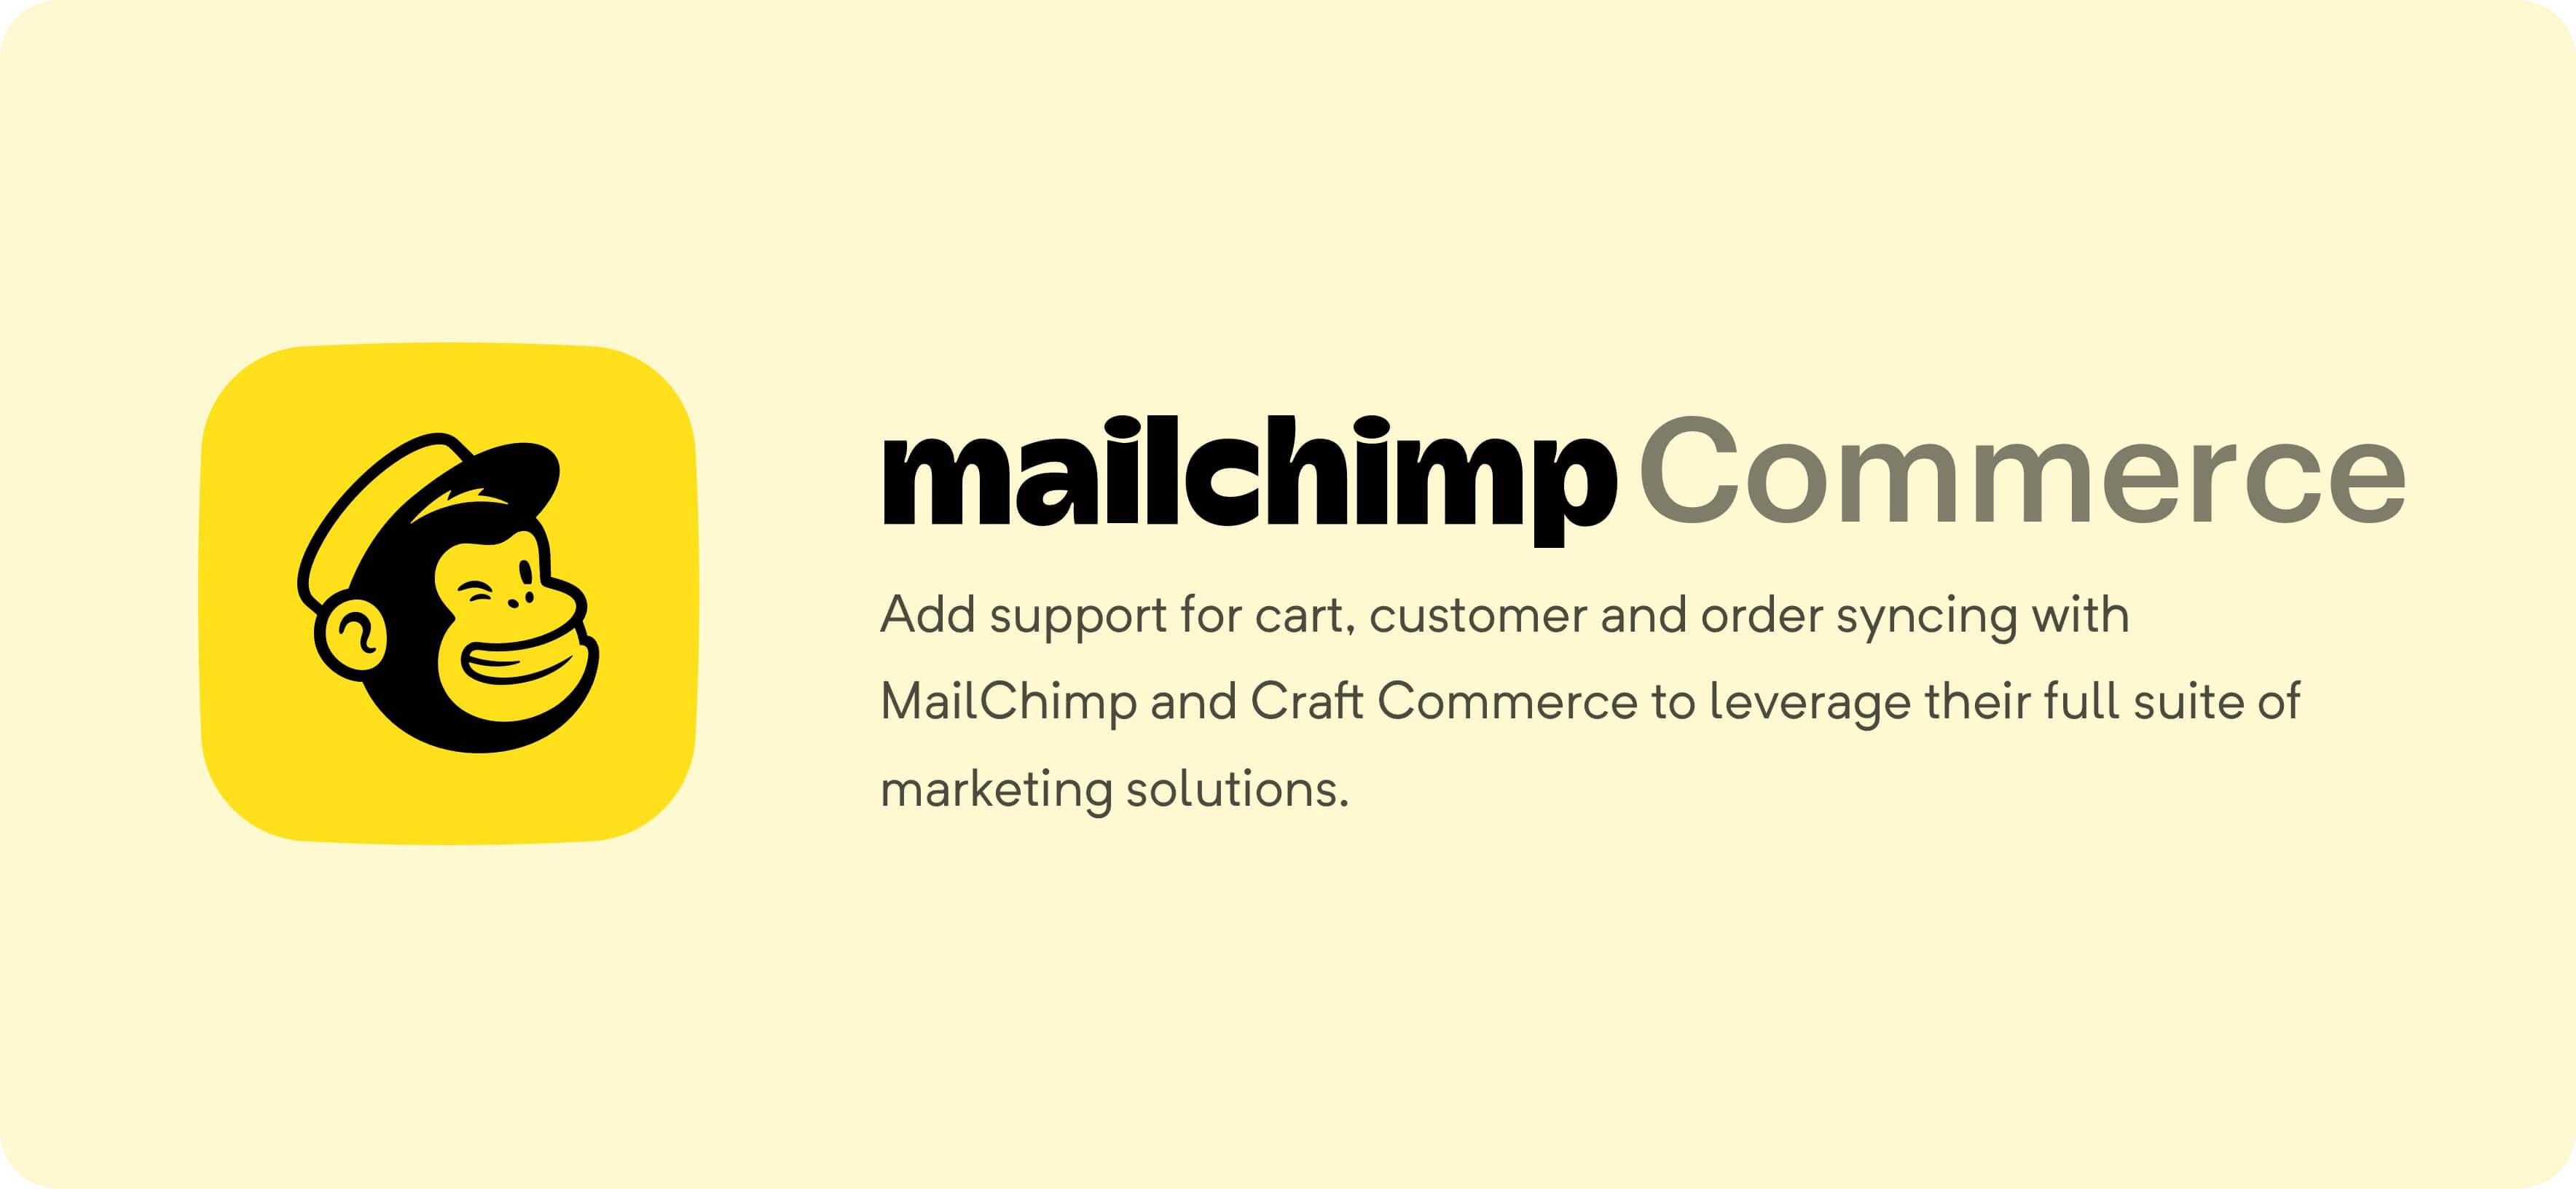 Mailchimp for Craft Commerce